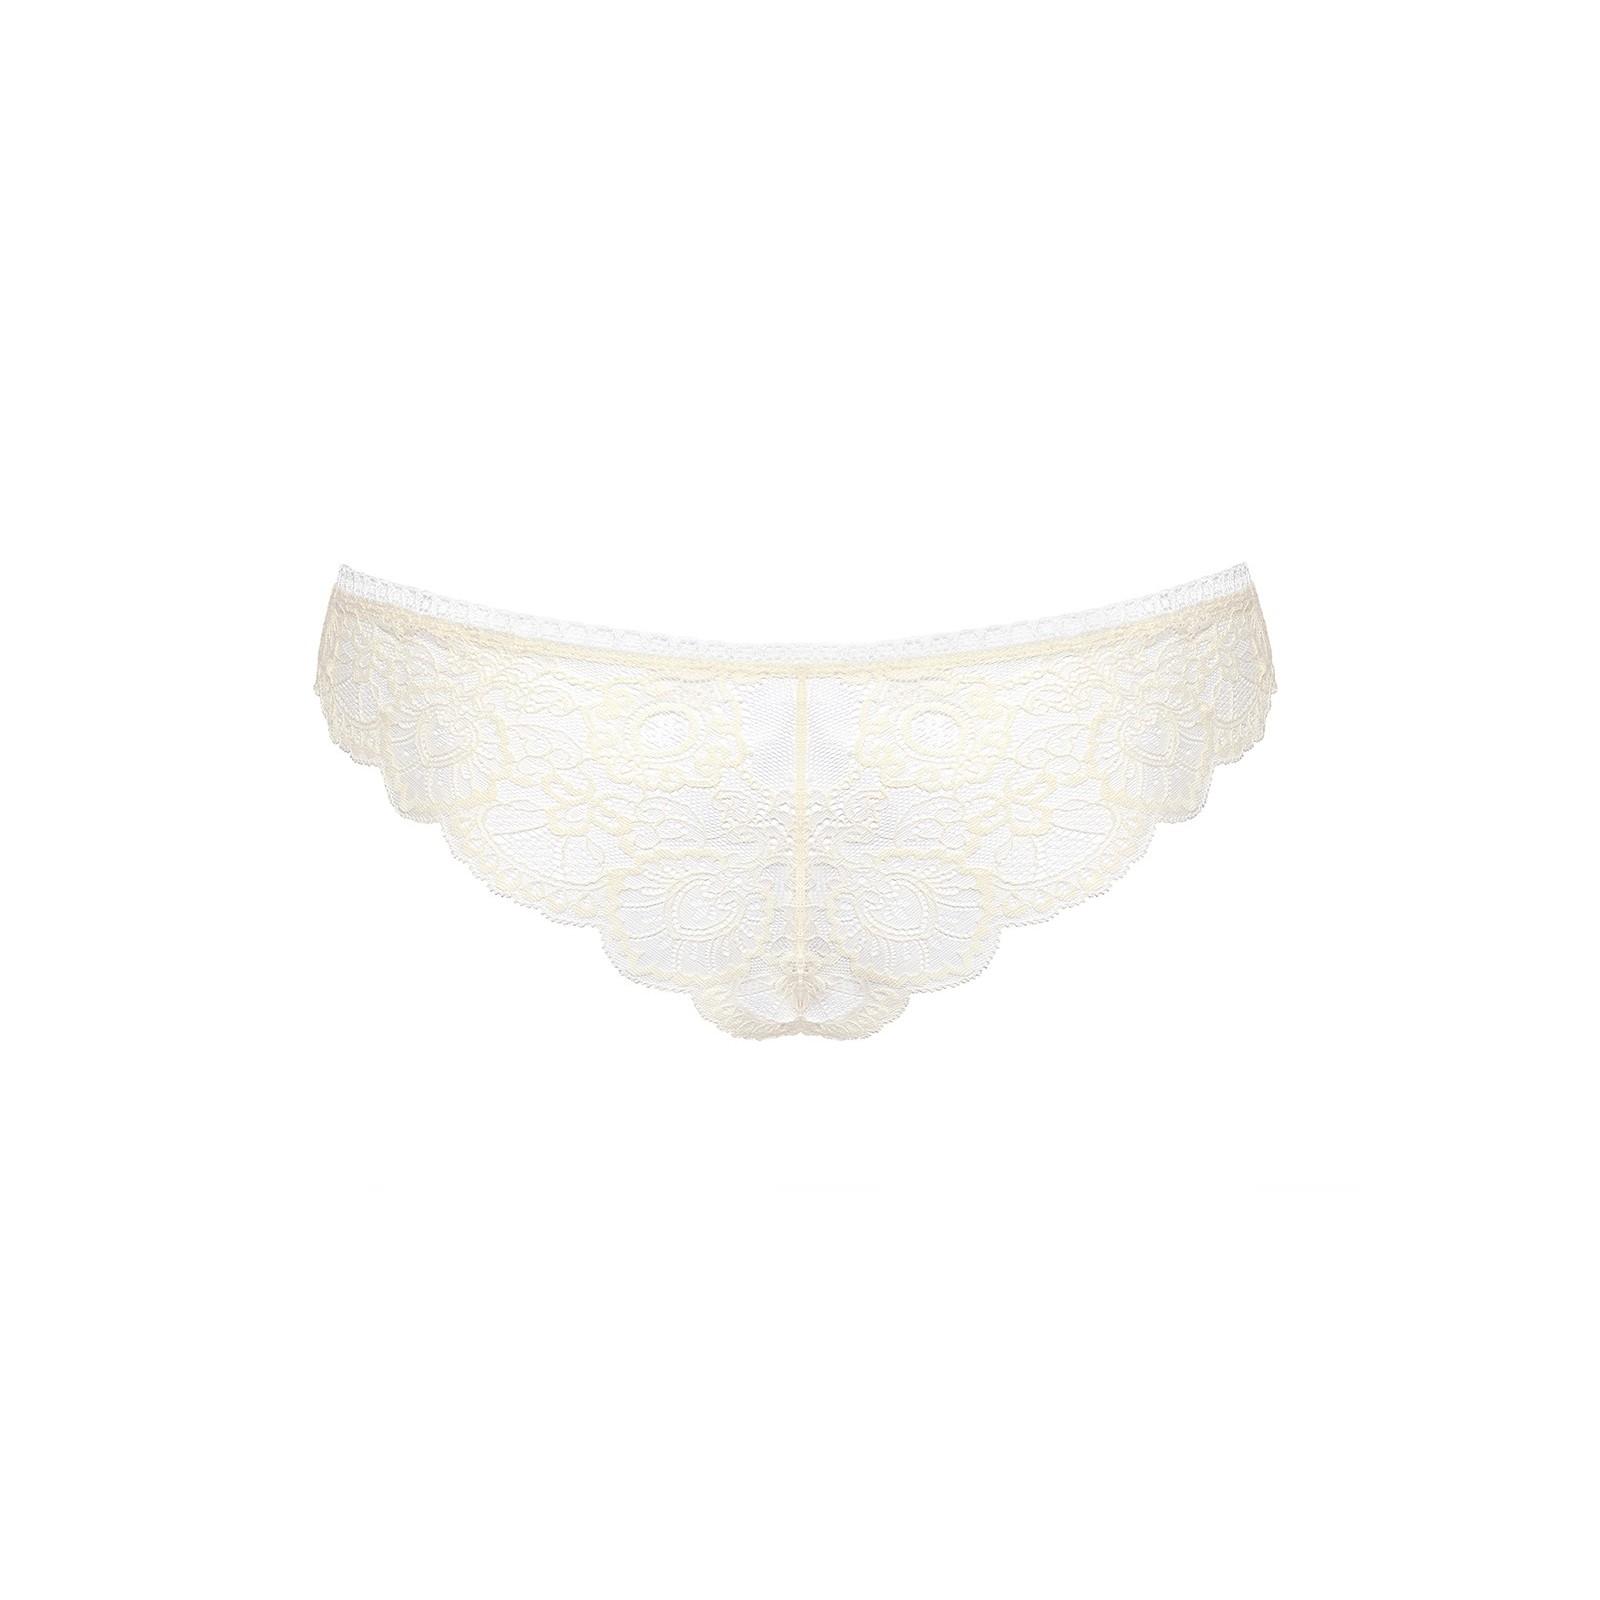 874-PAN-2 Panties weiß/beige - 8 - Vorschaubild